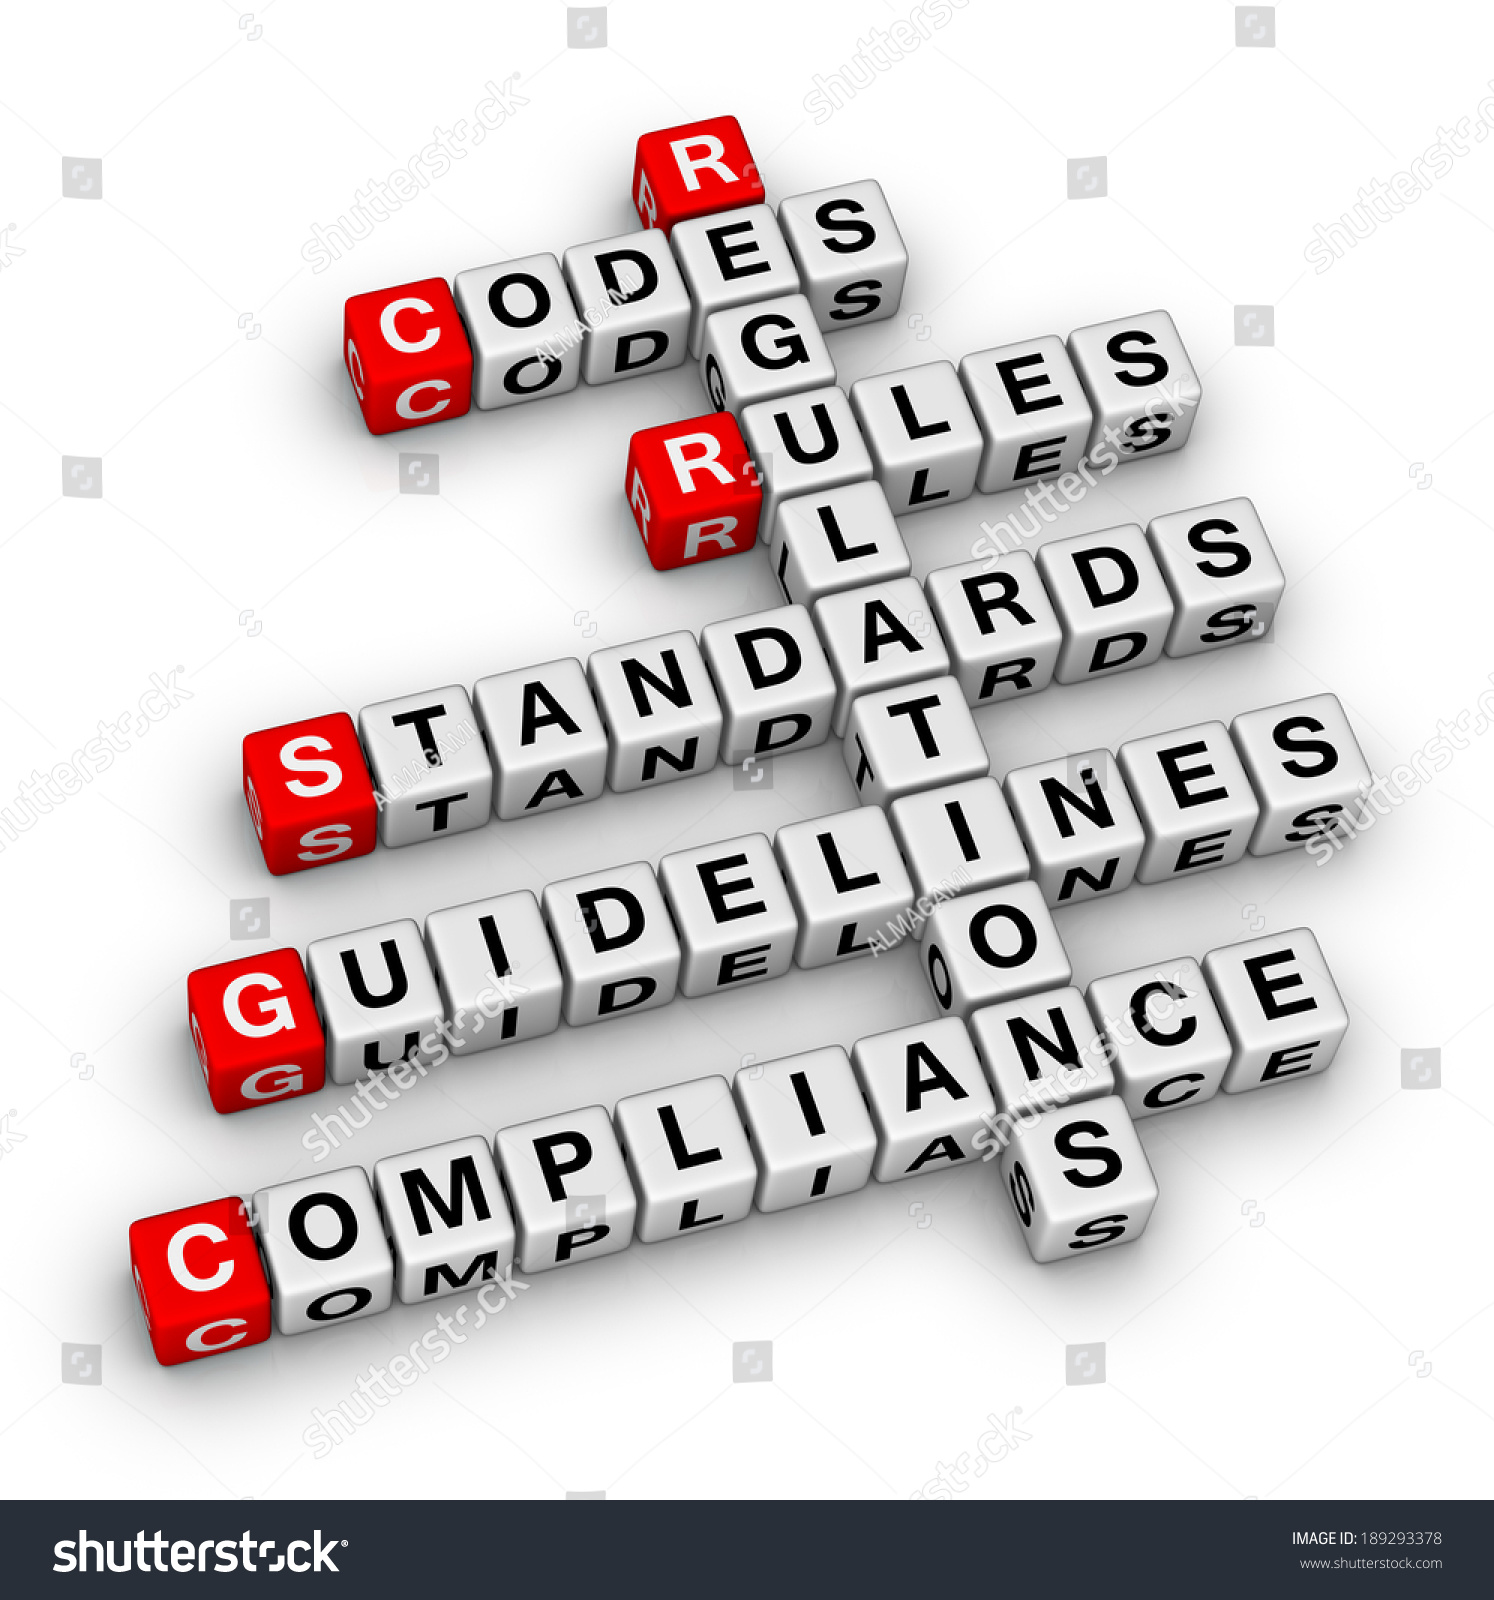 compliance crossword puzzle stock photo 189293378